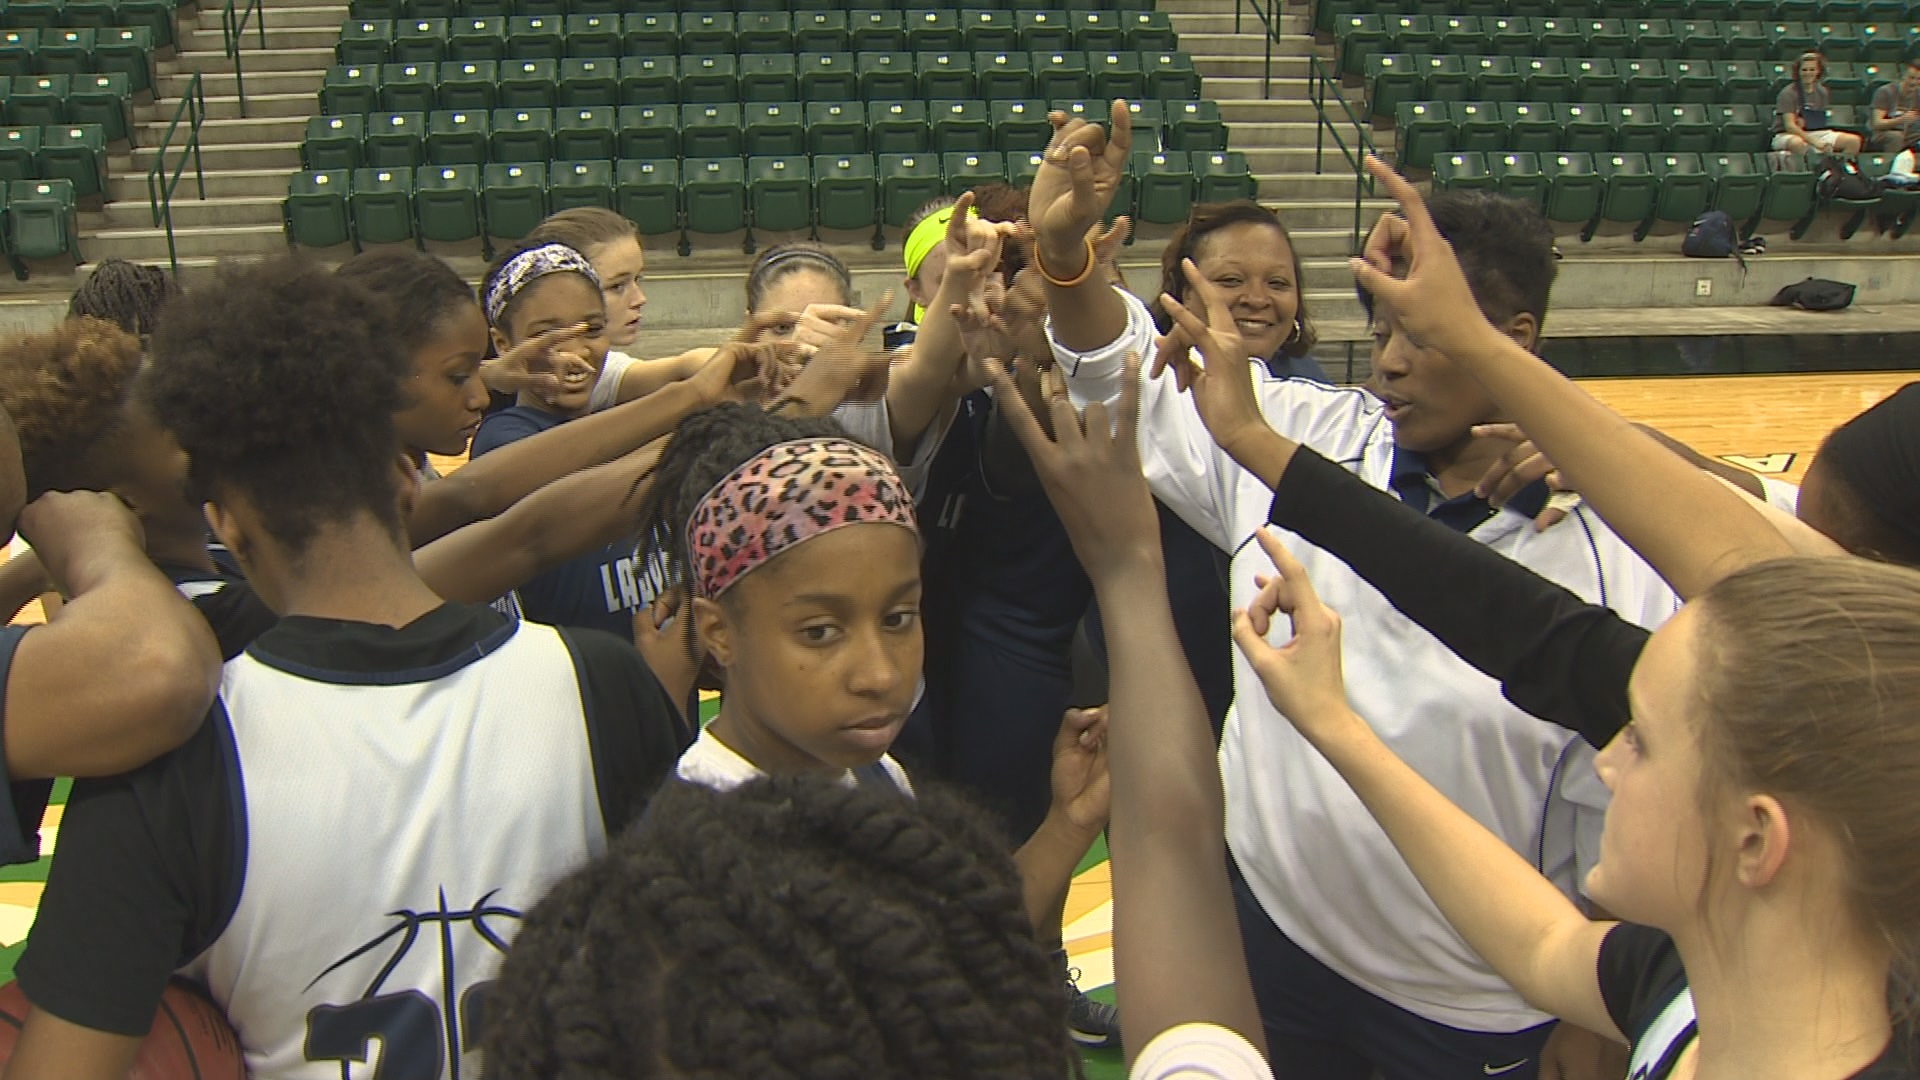 hickory ridge girls Coach tolonda simmons team was 24-5 last season and returns three starters.